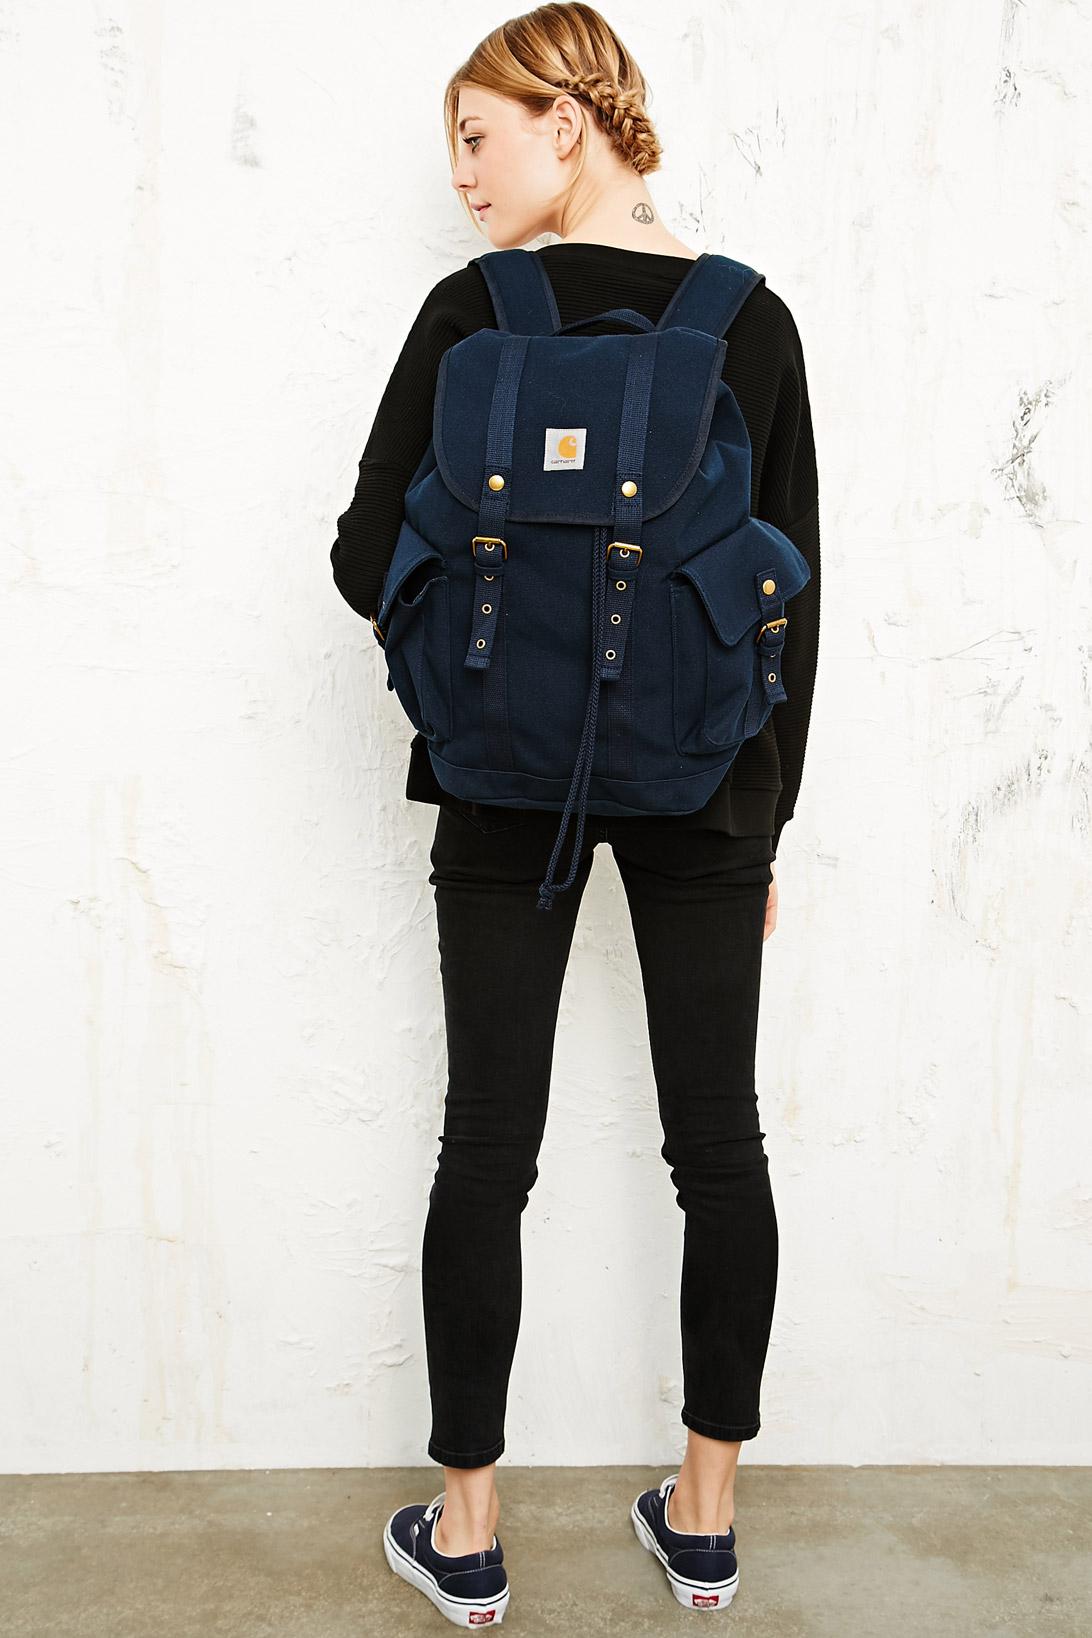 Carhartt Tramp Backpack in Blue - Lyst